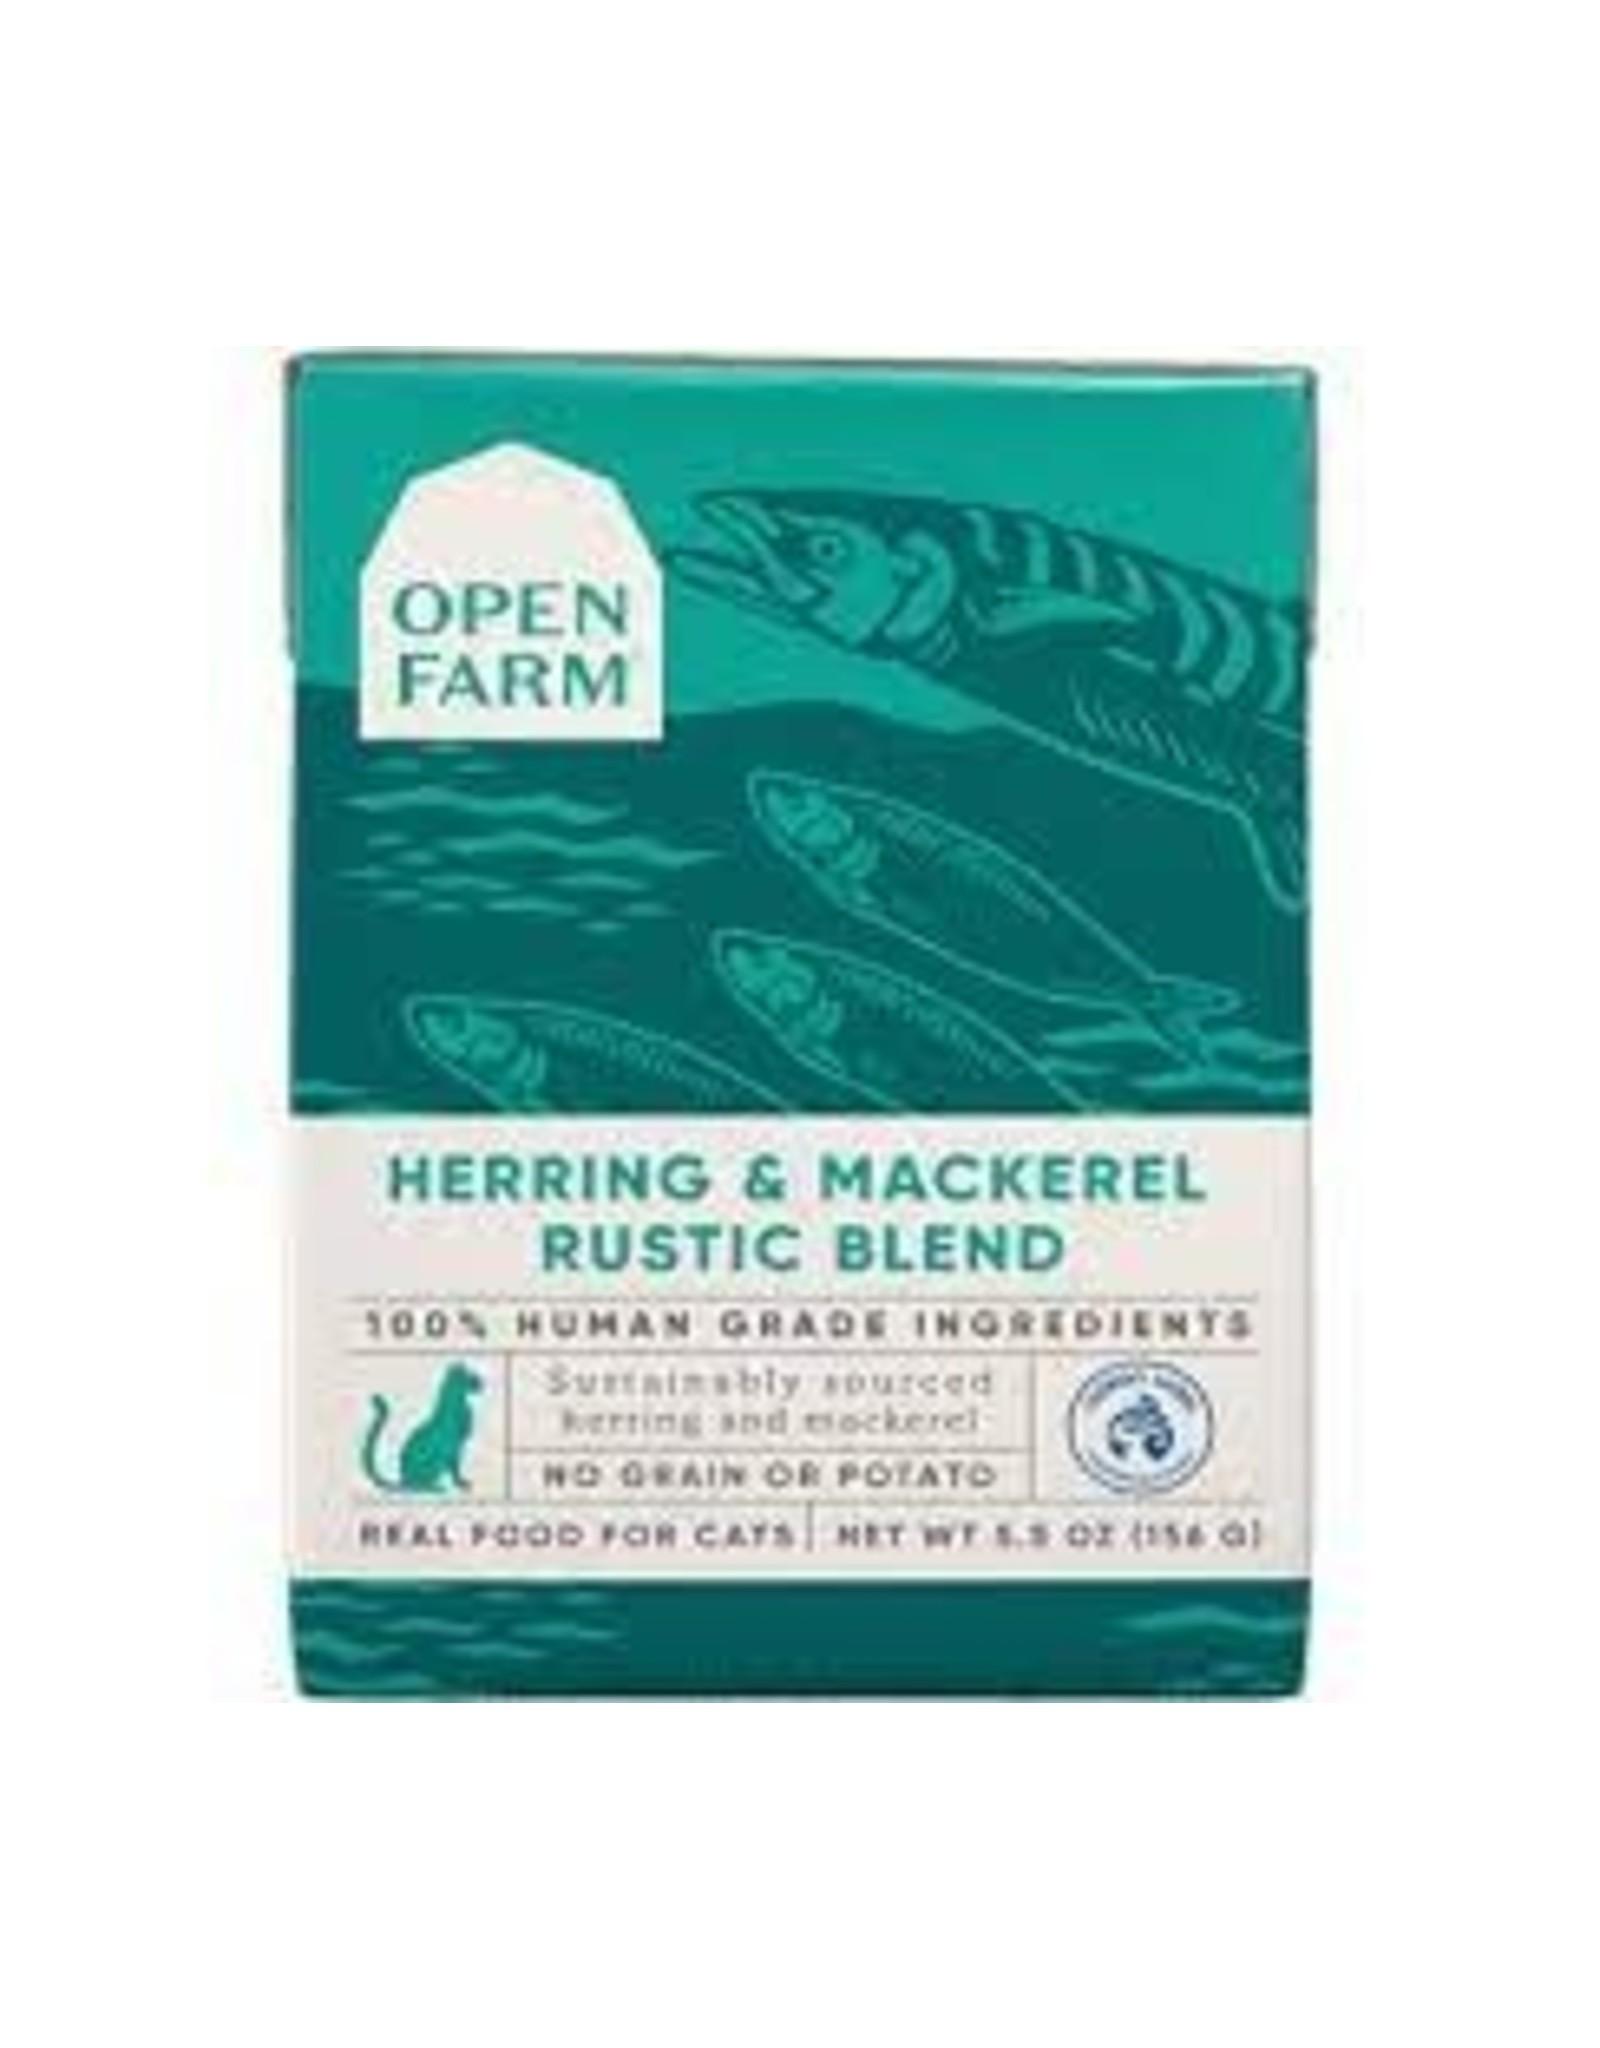 Open Farm Herring & Mackerel Rustic Blend (Cat Food), 5.5oz